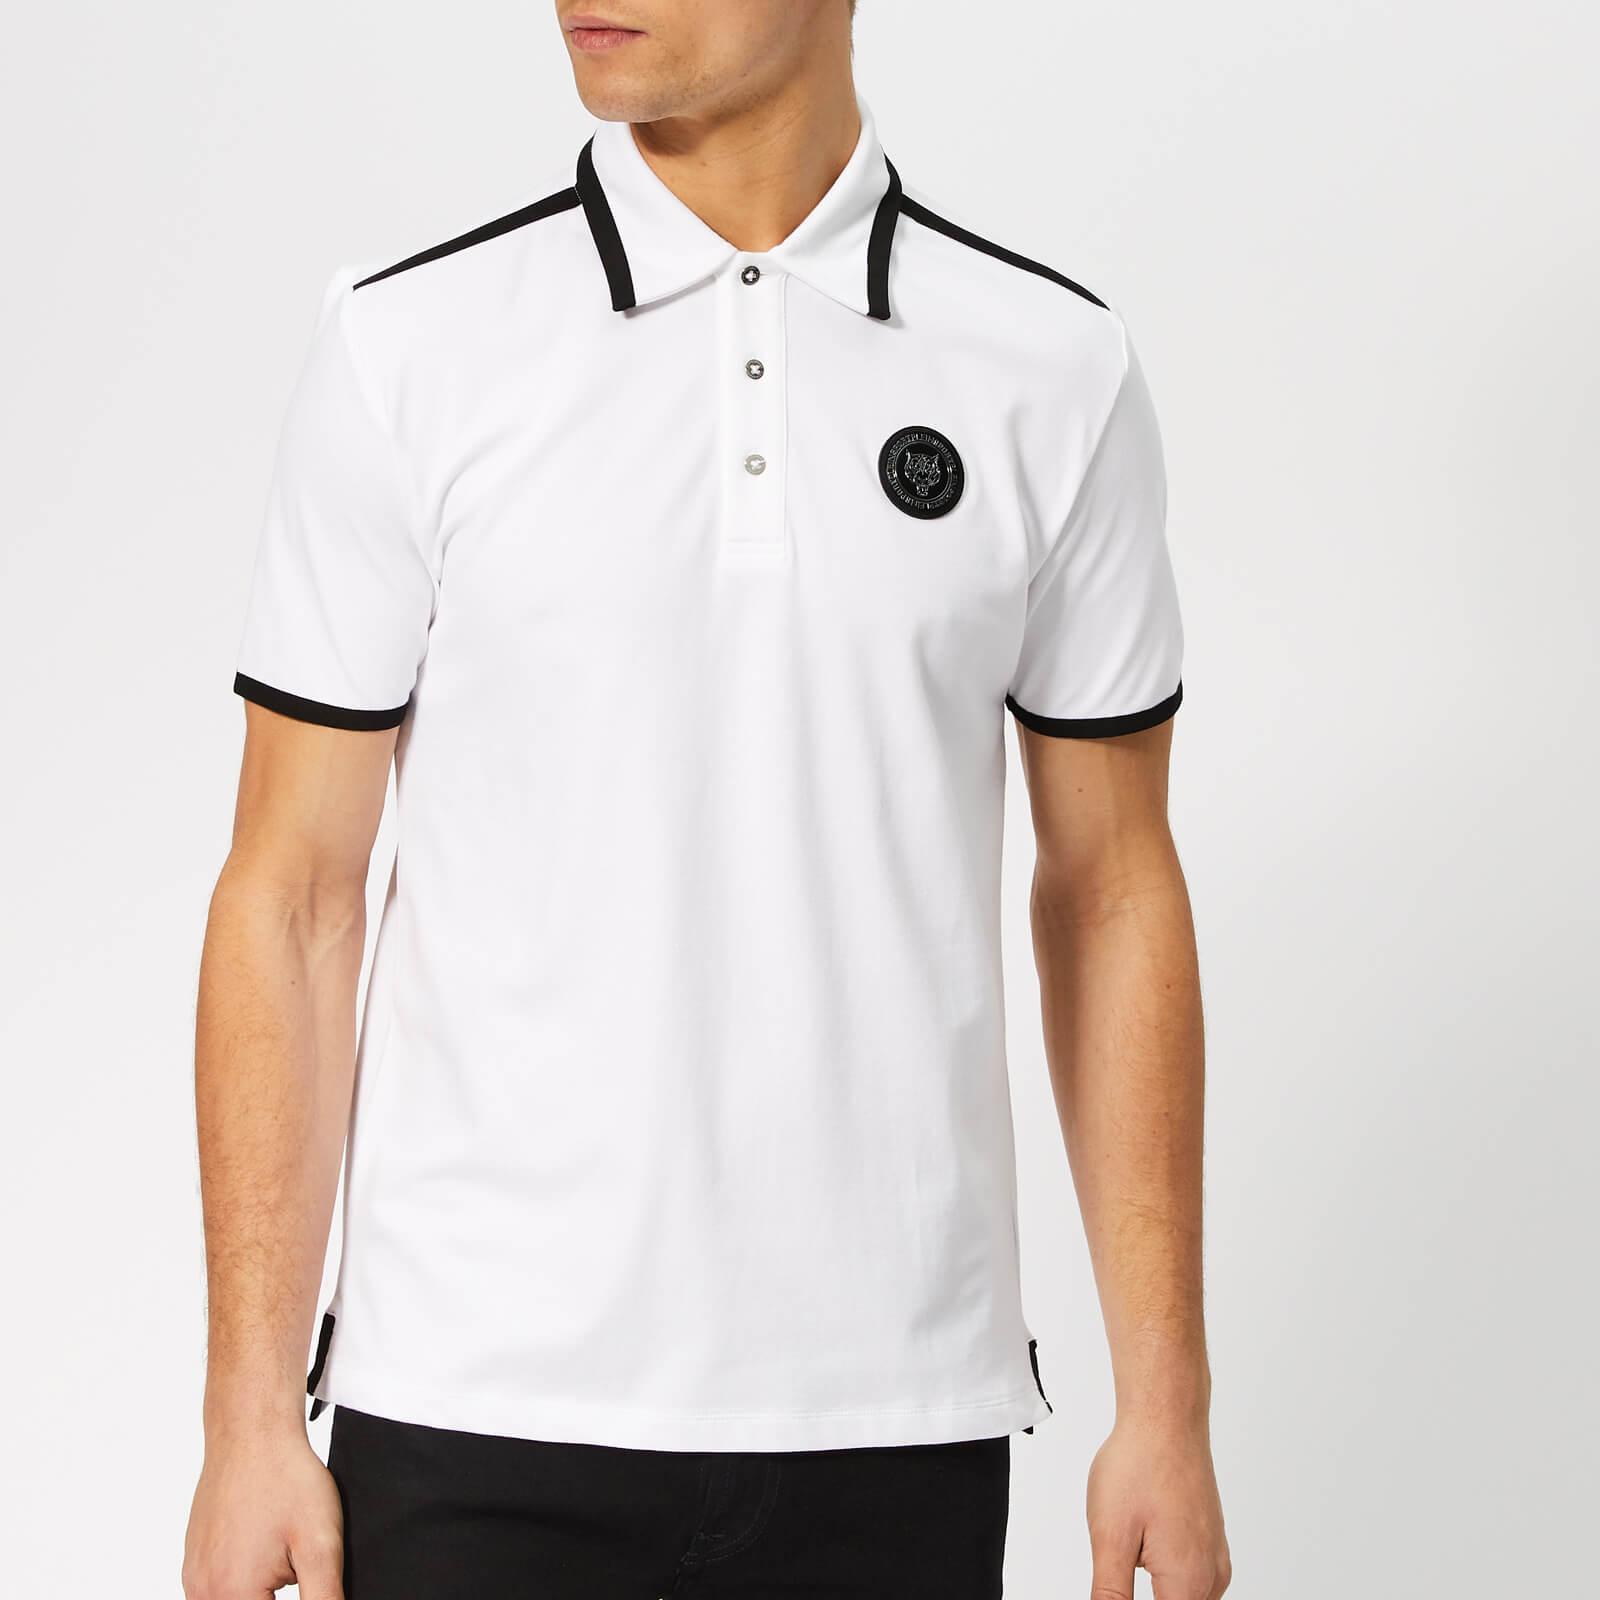 Plein Sport Men's Tiger Polo Shirt - White - L - White